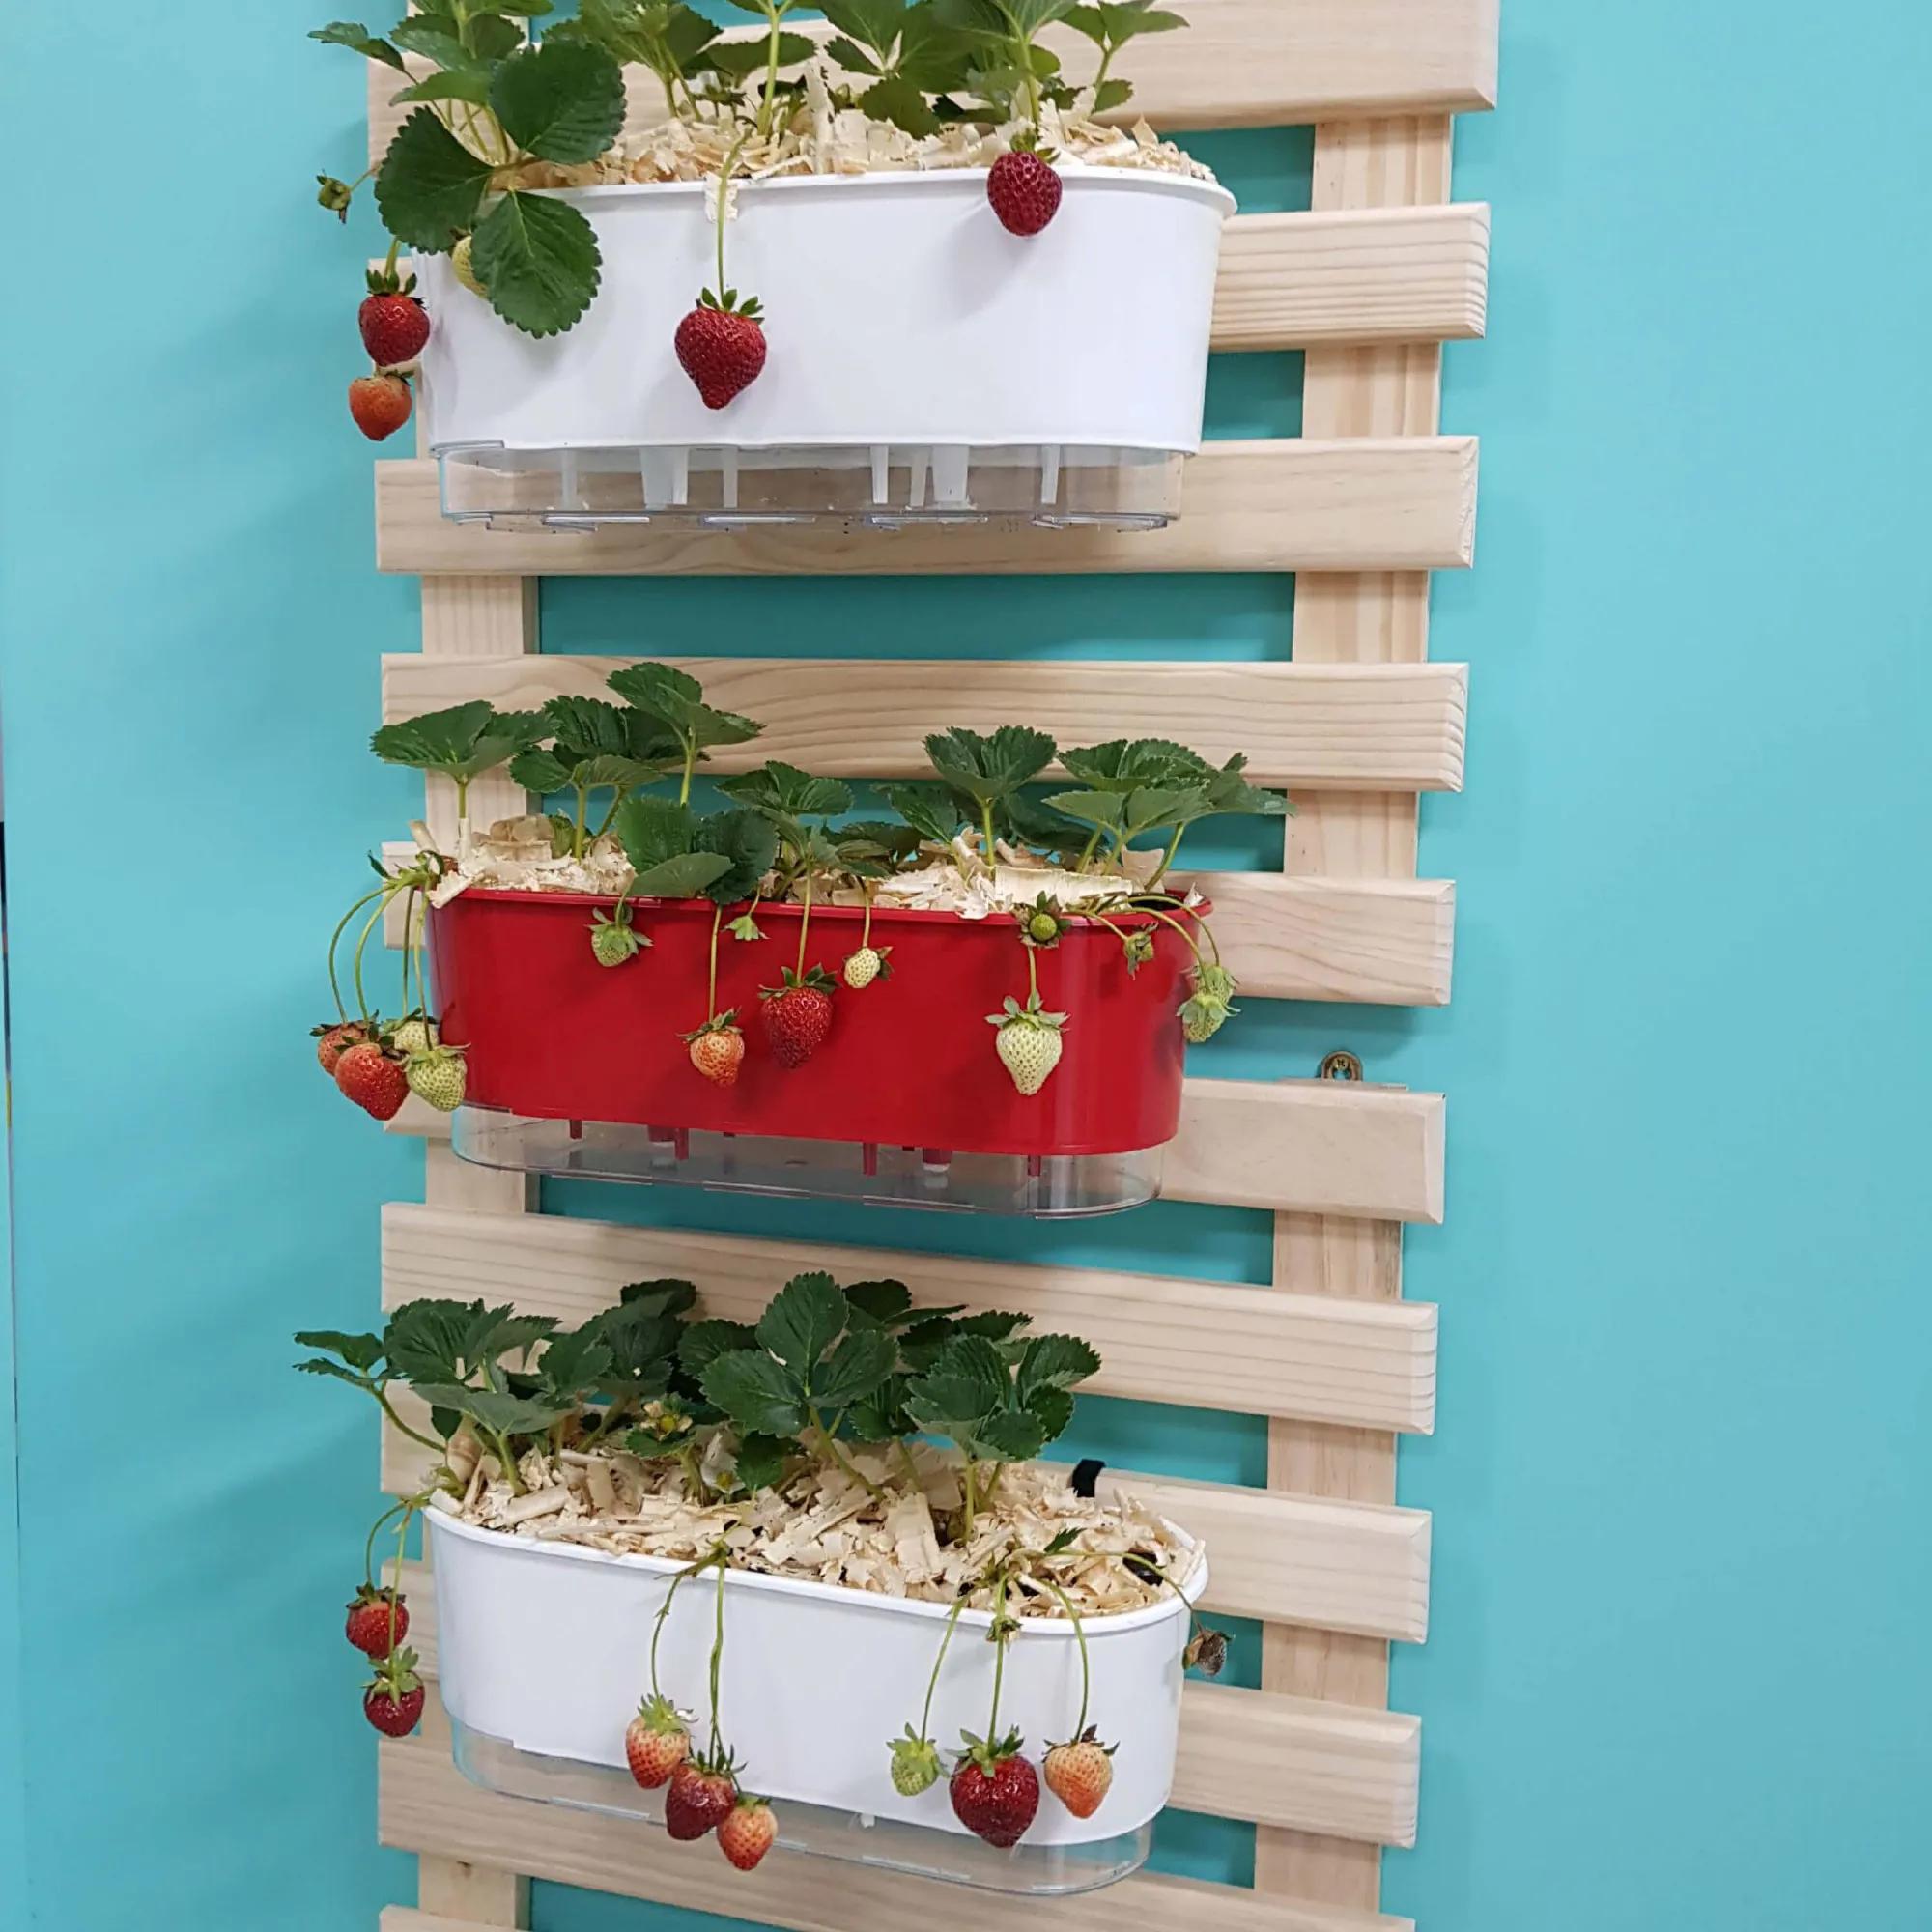 Kit Horta de Morangos 60cm x 100cm com 3 Jardineiras  - Vasos Raiz Loja Oficial